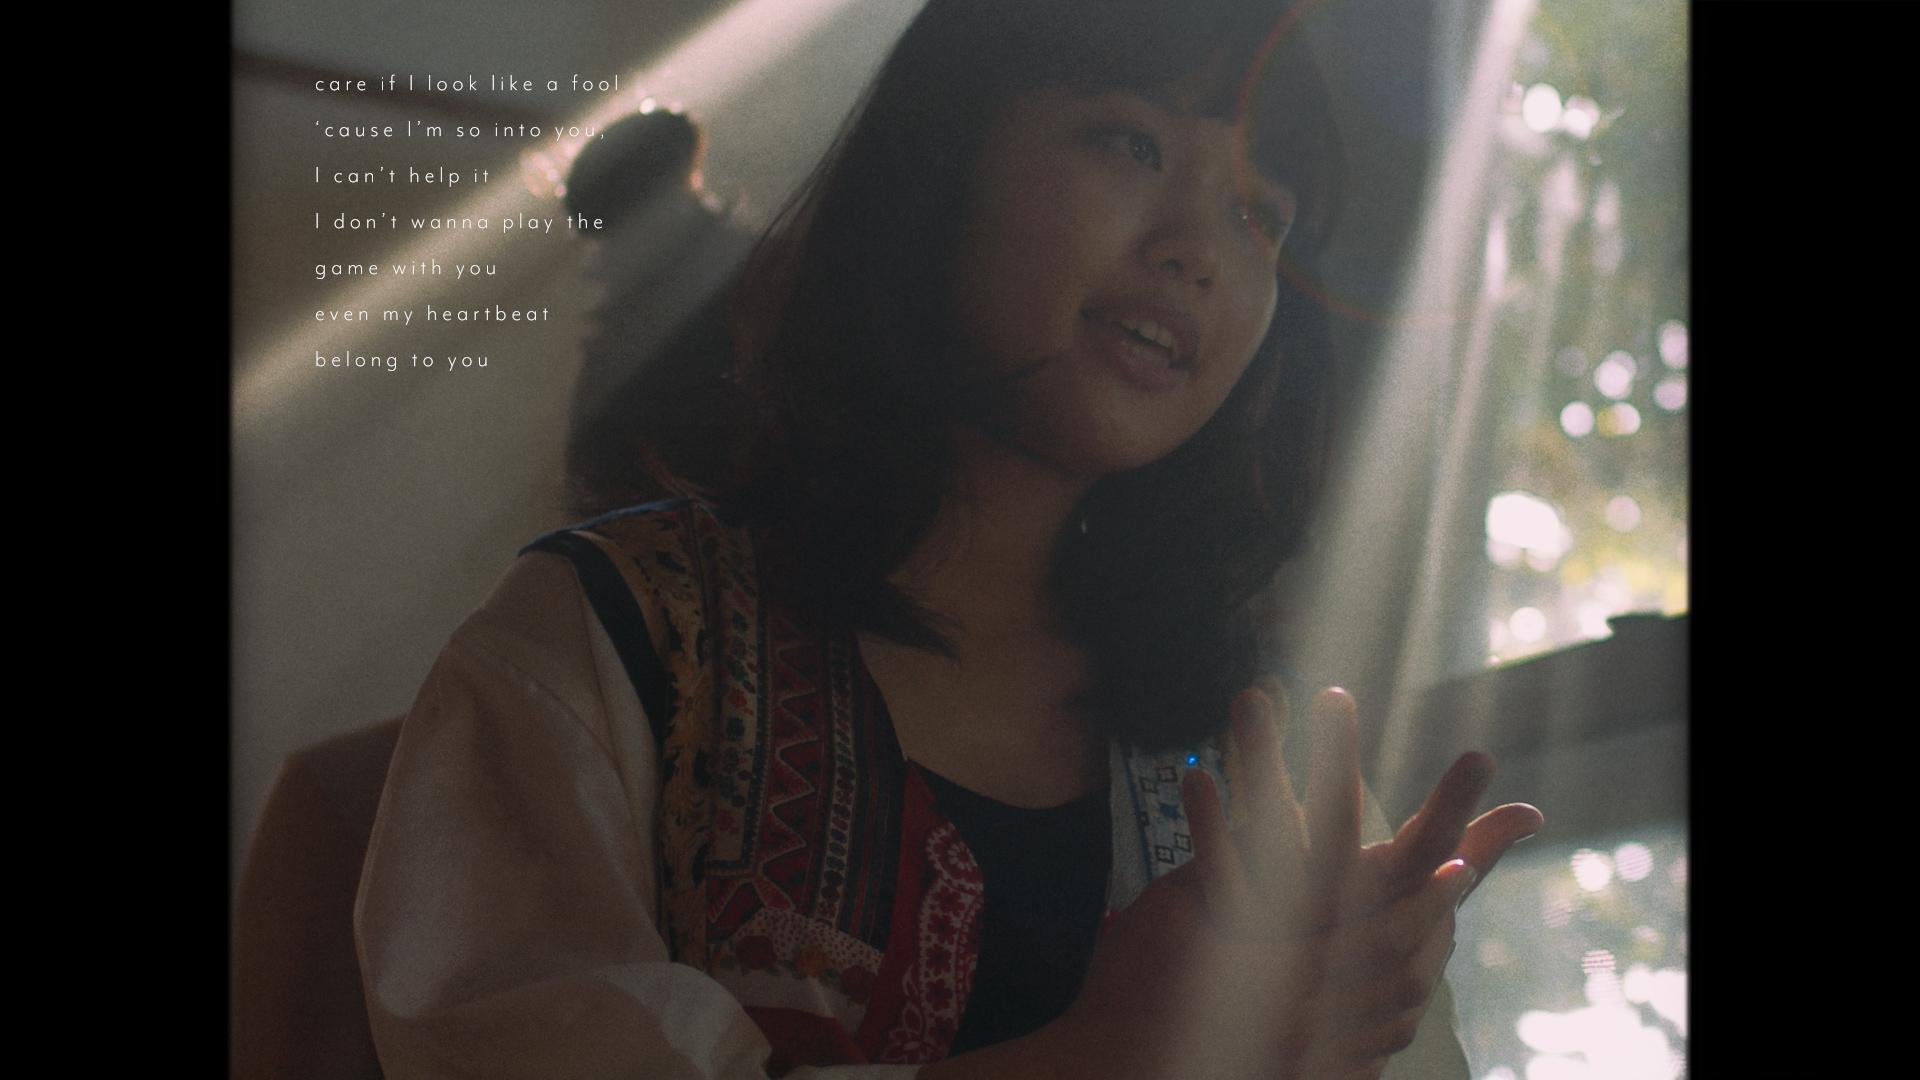 "NABOWA_My Heartbeat (Belong To You)feat. å±±ç""°ãªã¥.mp4.00_03_40_02.Still026.jpg"